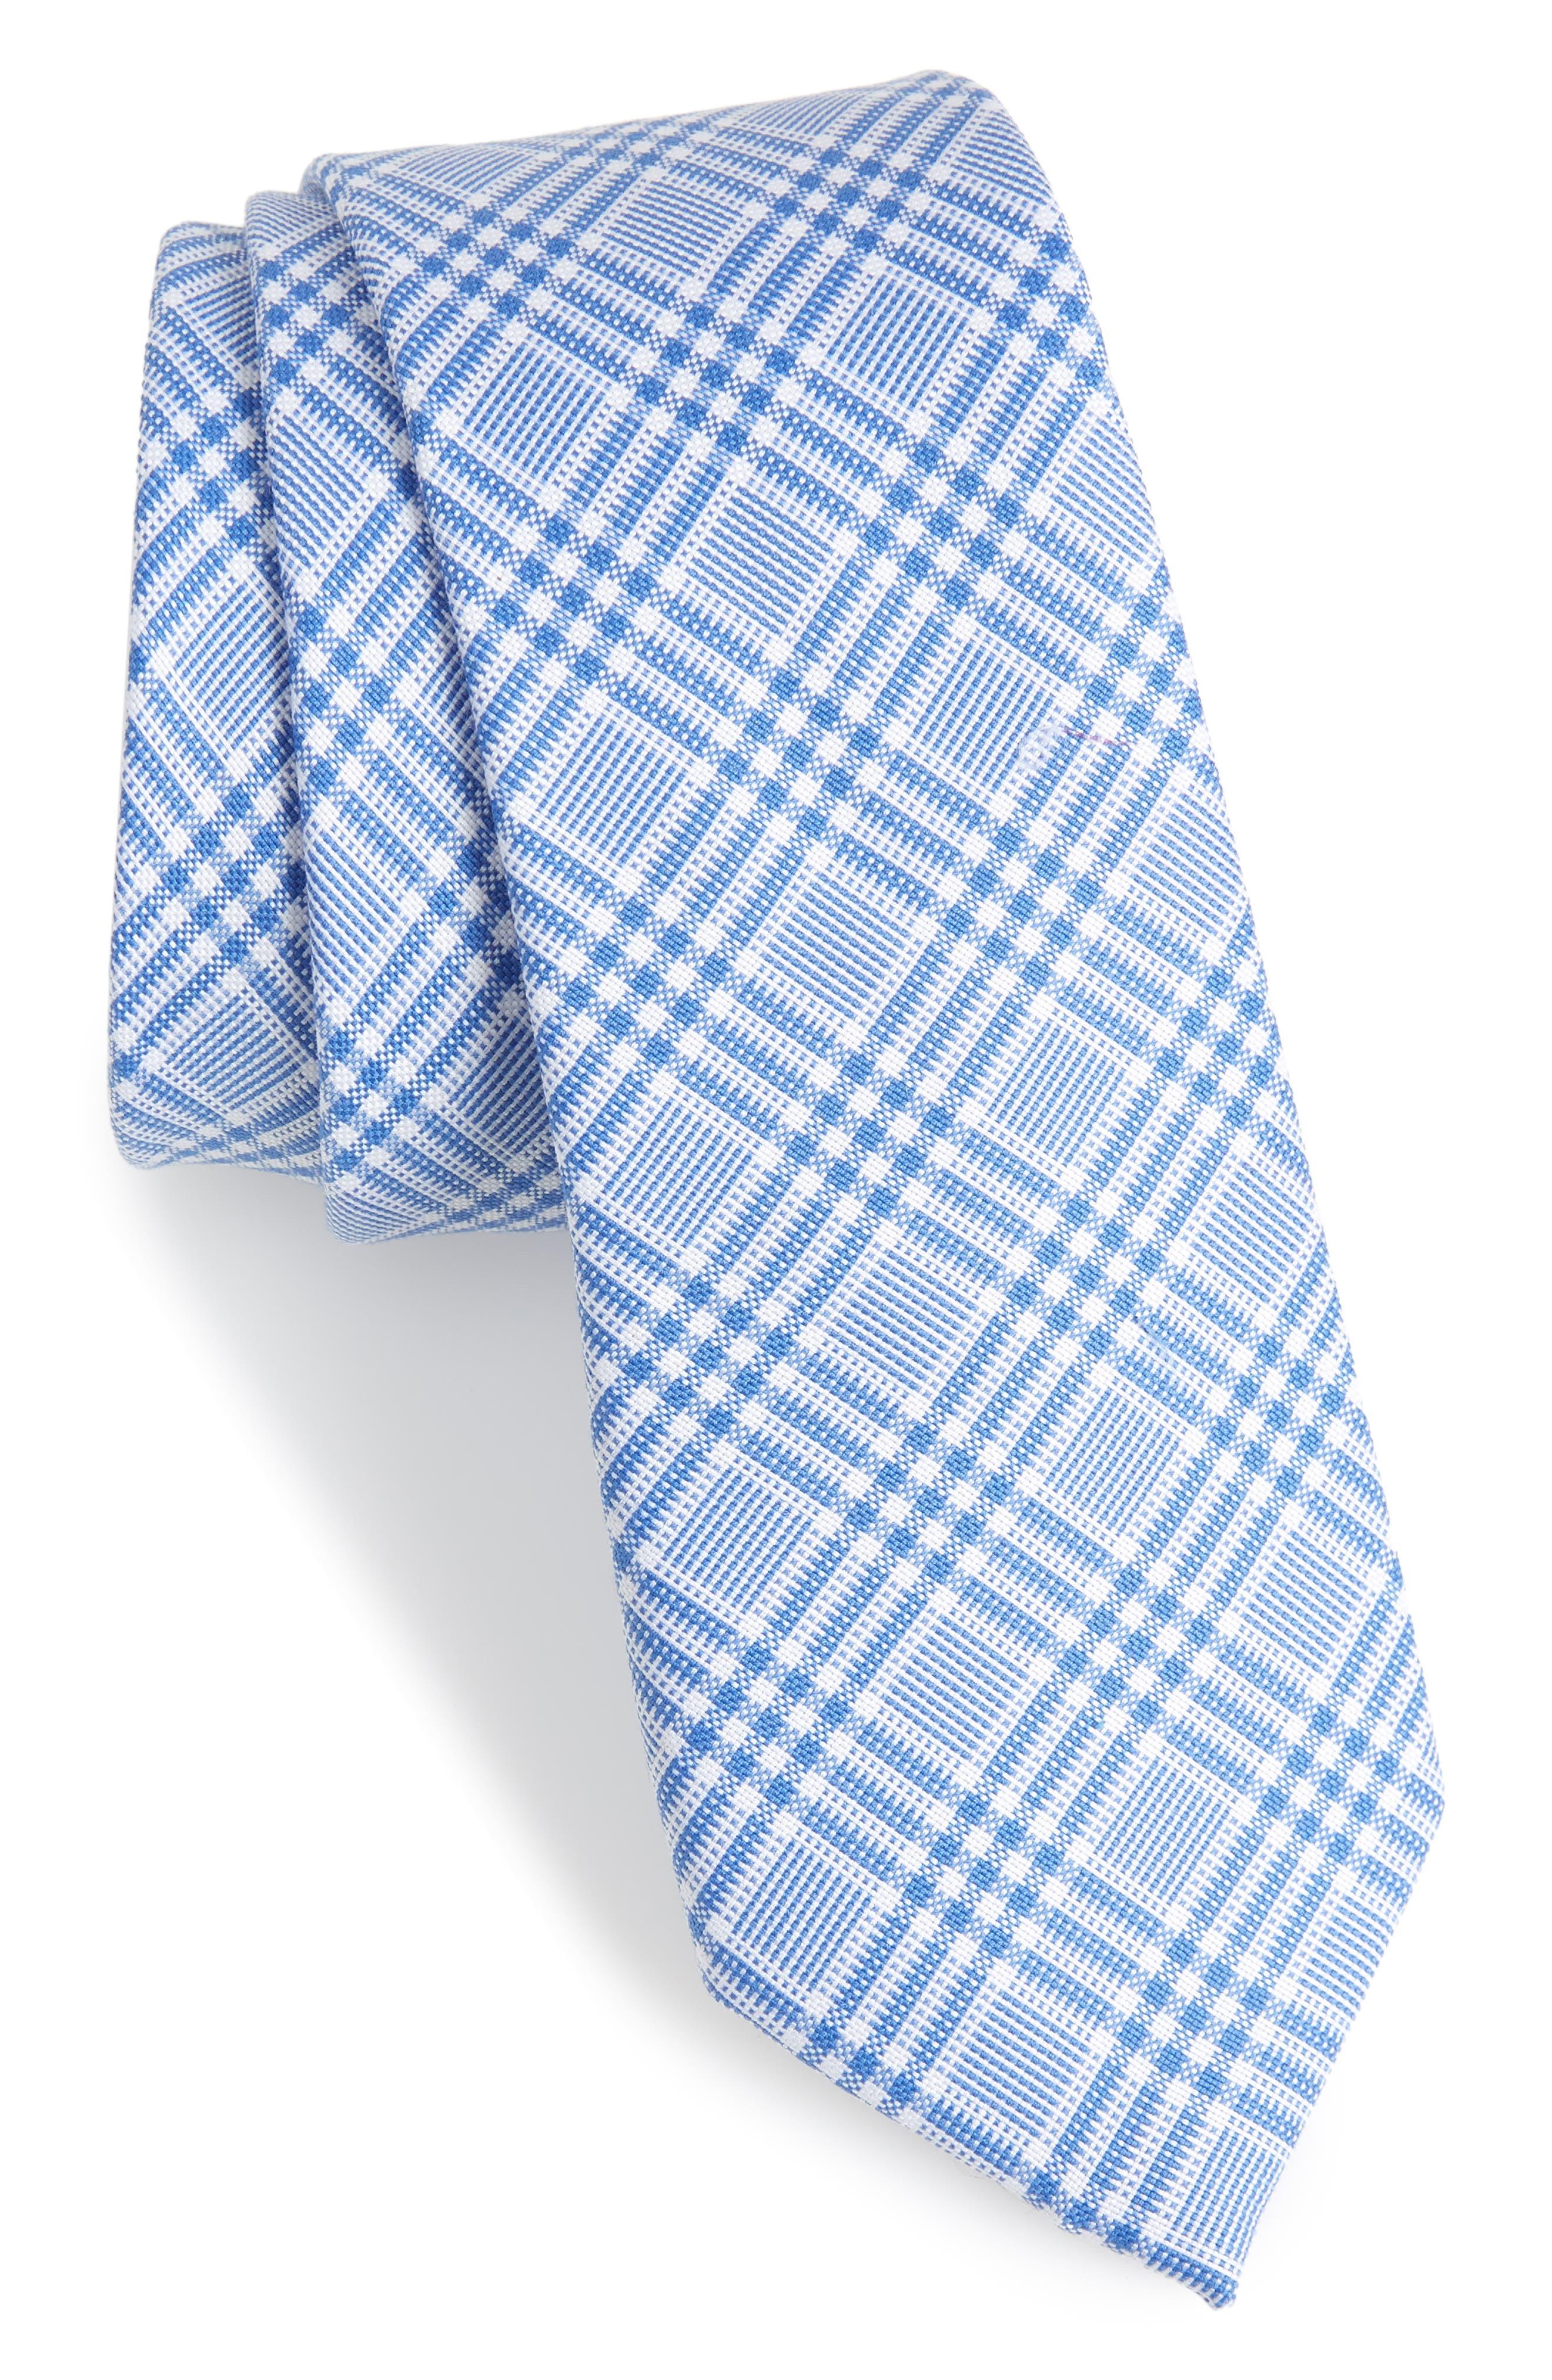 Brook Plaid Cotton Skinny Tie,                         Main,                         color, Blue